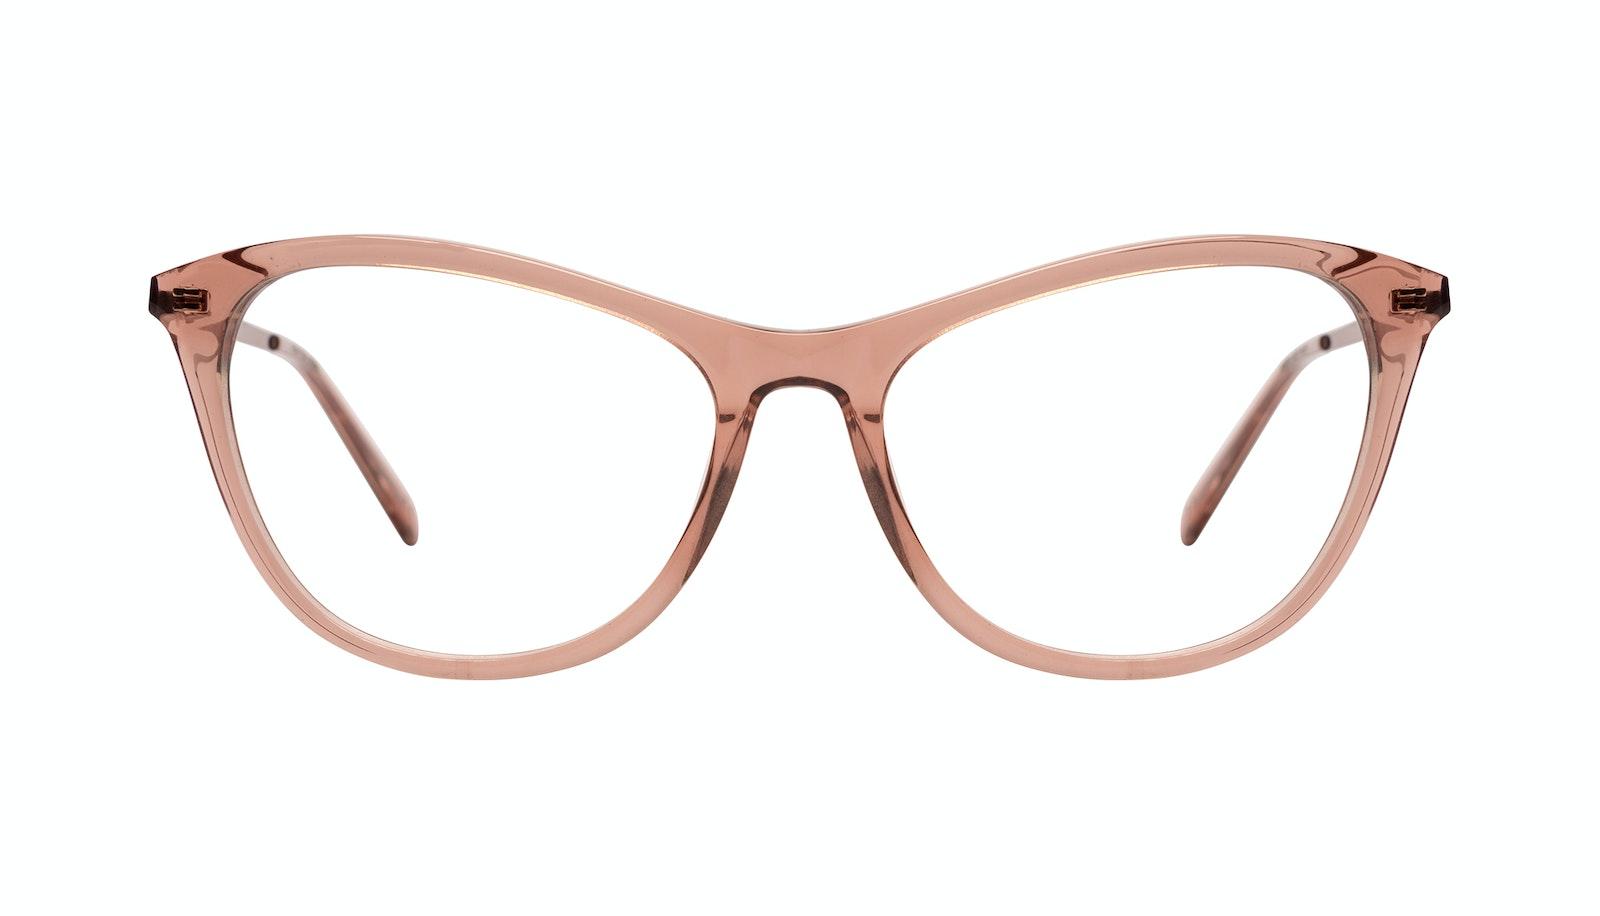 Affordable Fashion Glasses Rectangle Eyeglasses Women Folk Plus Rose